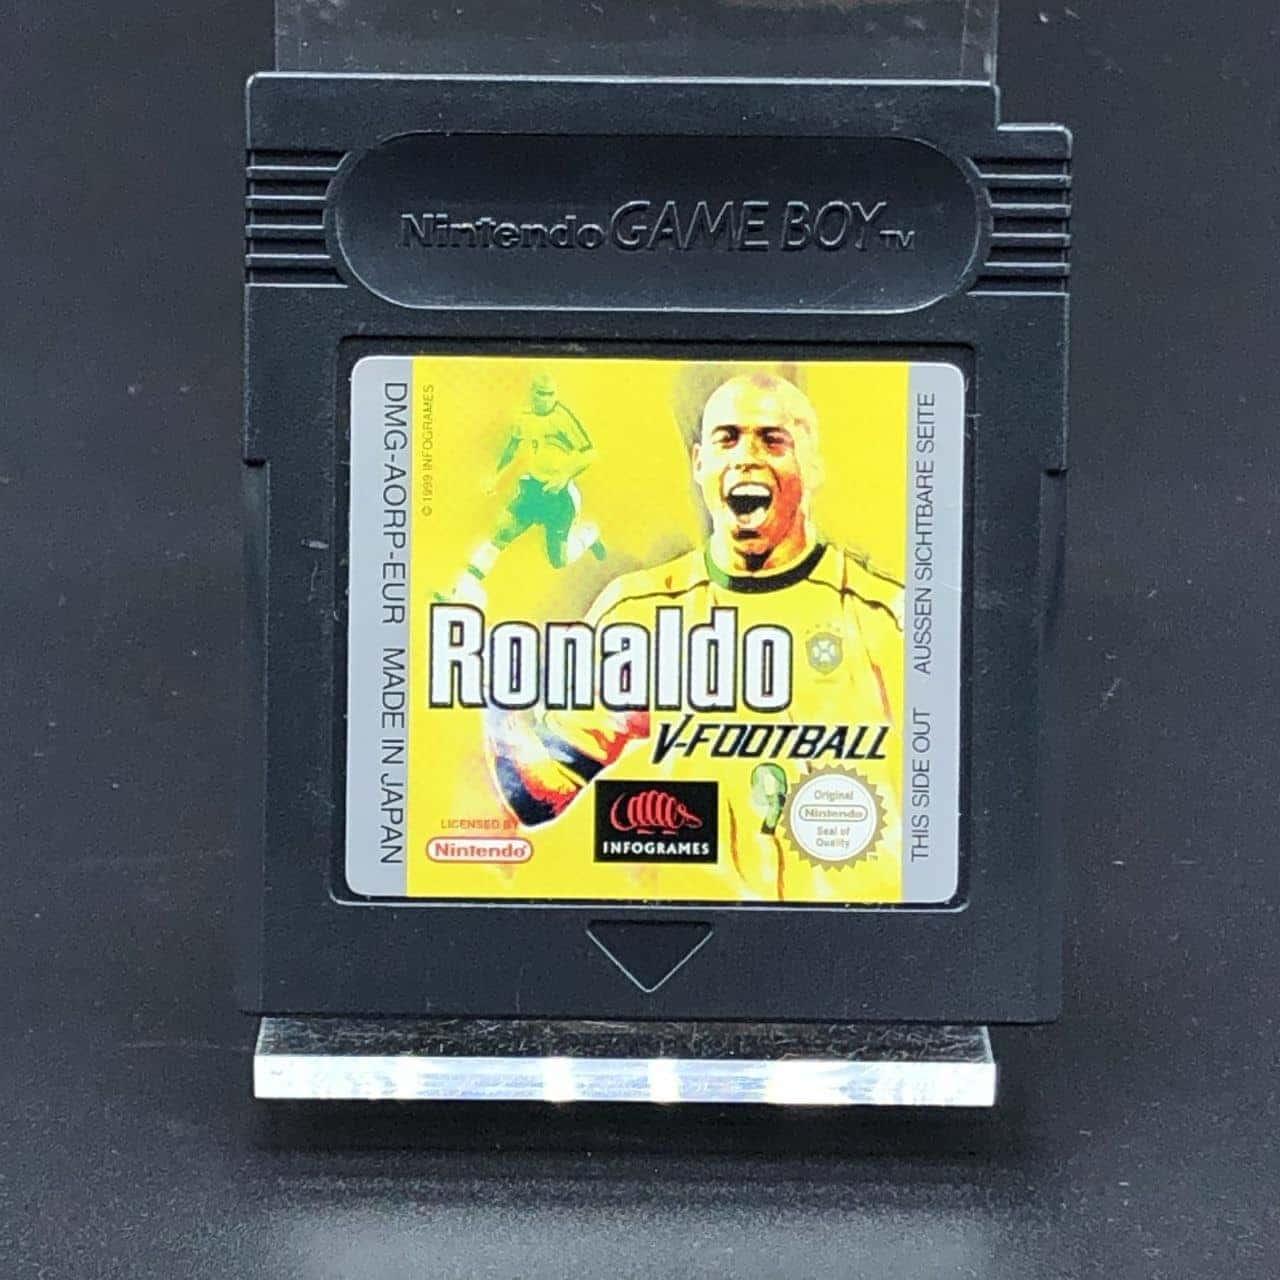 GBC Ronaldo V-Football (Modul) (Gut) Nintendo Game Boy Color